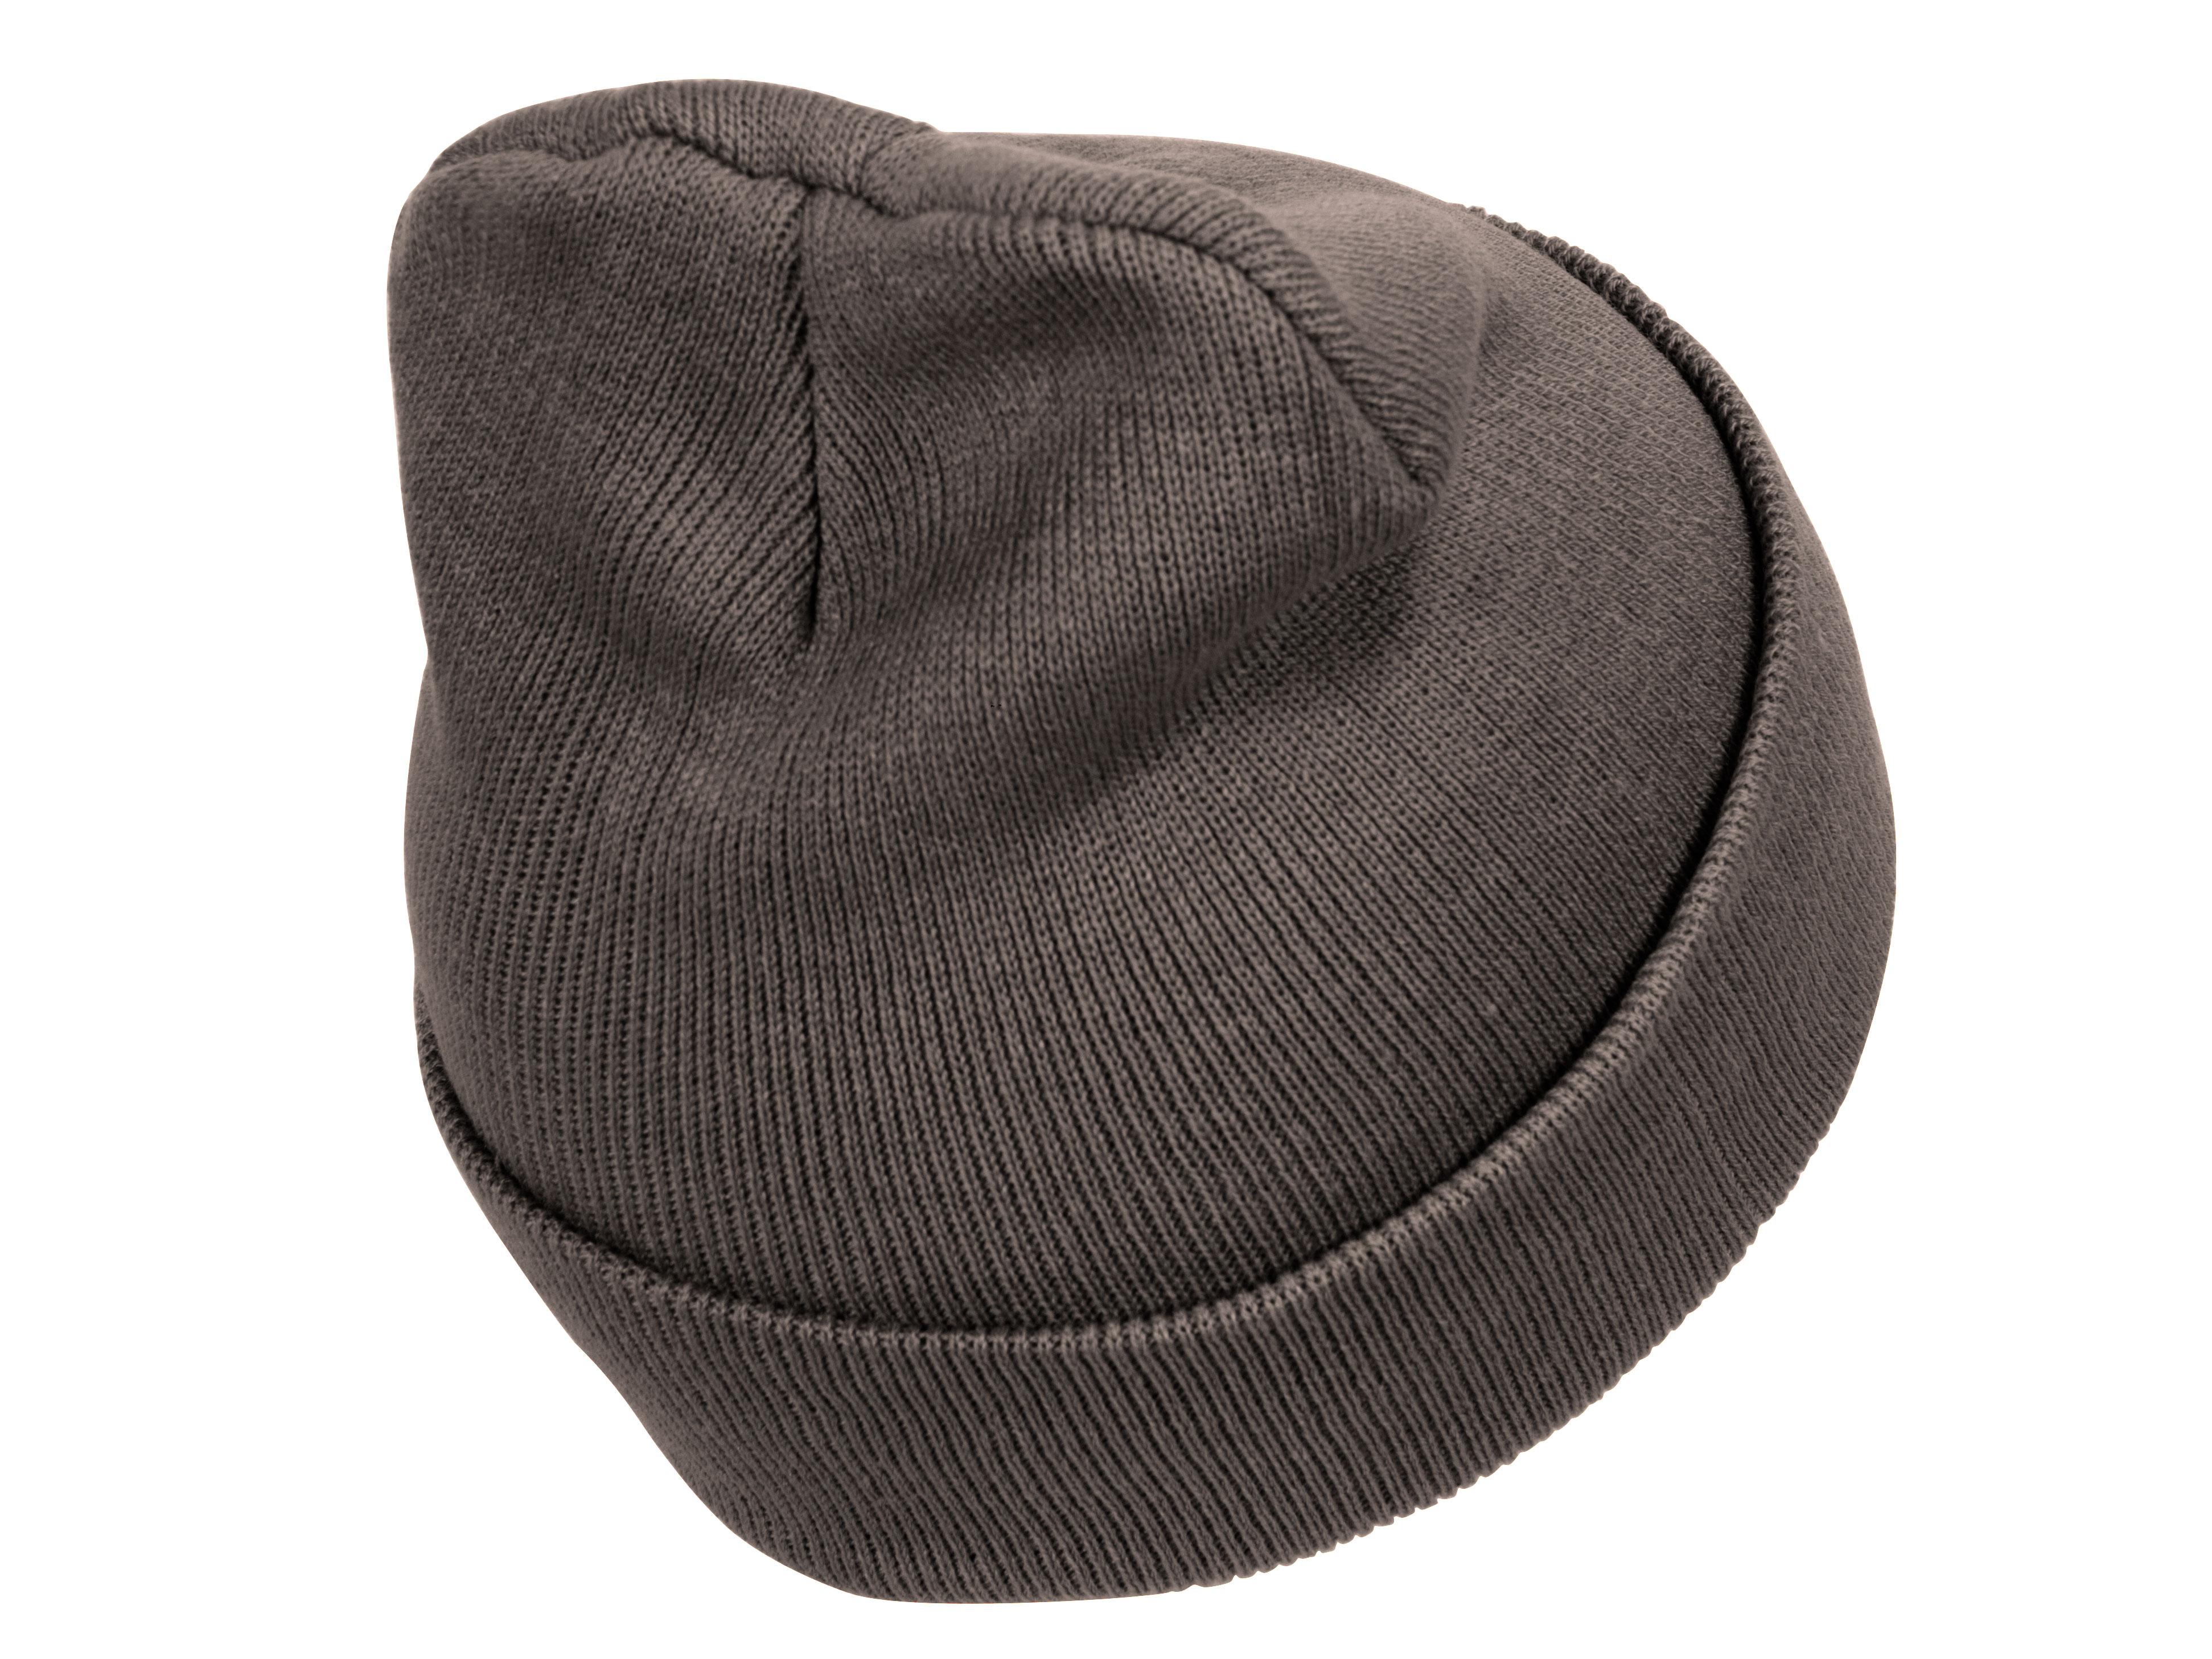 thumbnail 19 - Top Headwear Solid Winter Long Beanie - 12 Piece Wholesale